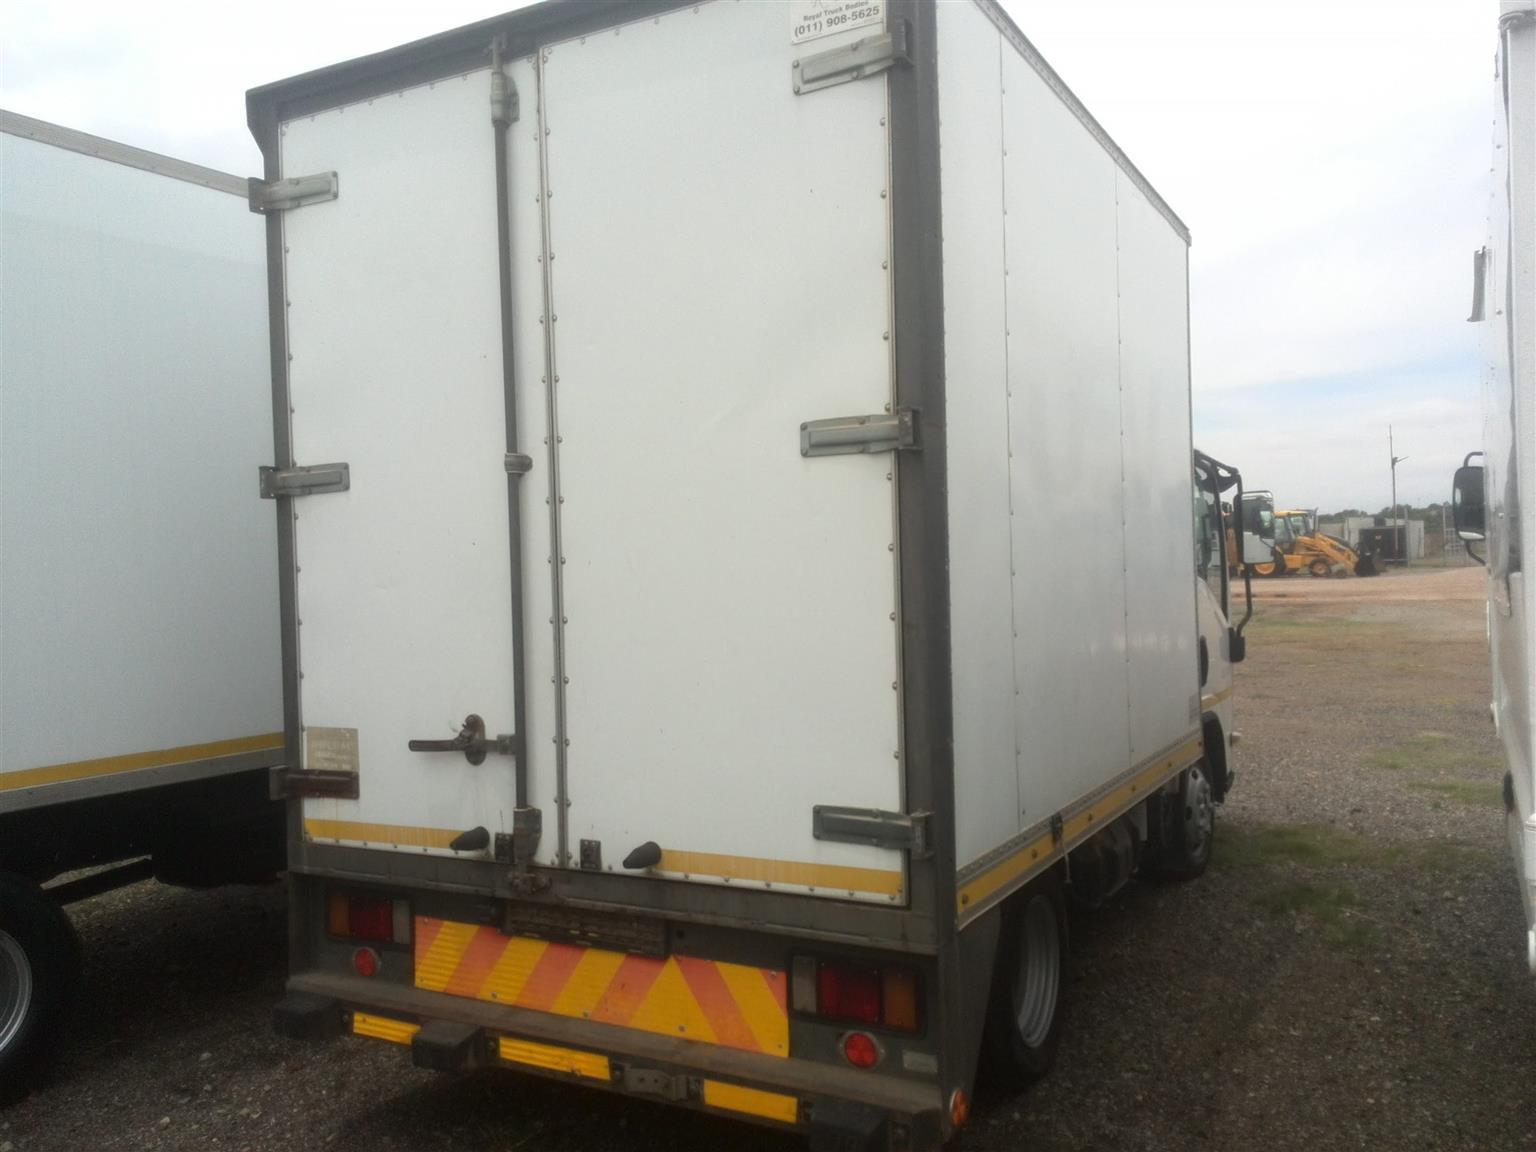 2013 - ISUZU TRUCK For Sale Posted by Lemeshen Pillay Ubuntu Truck Sales